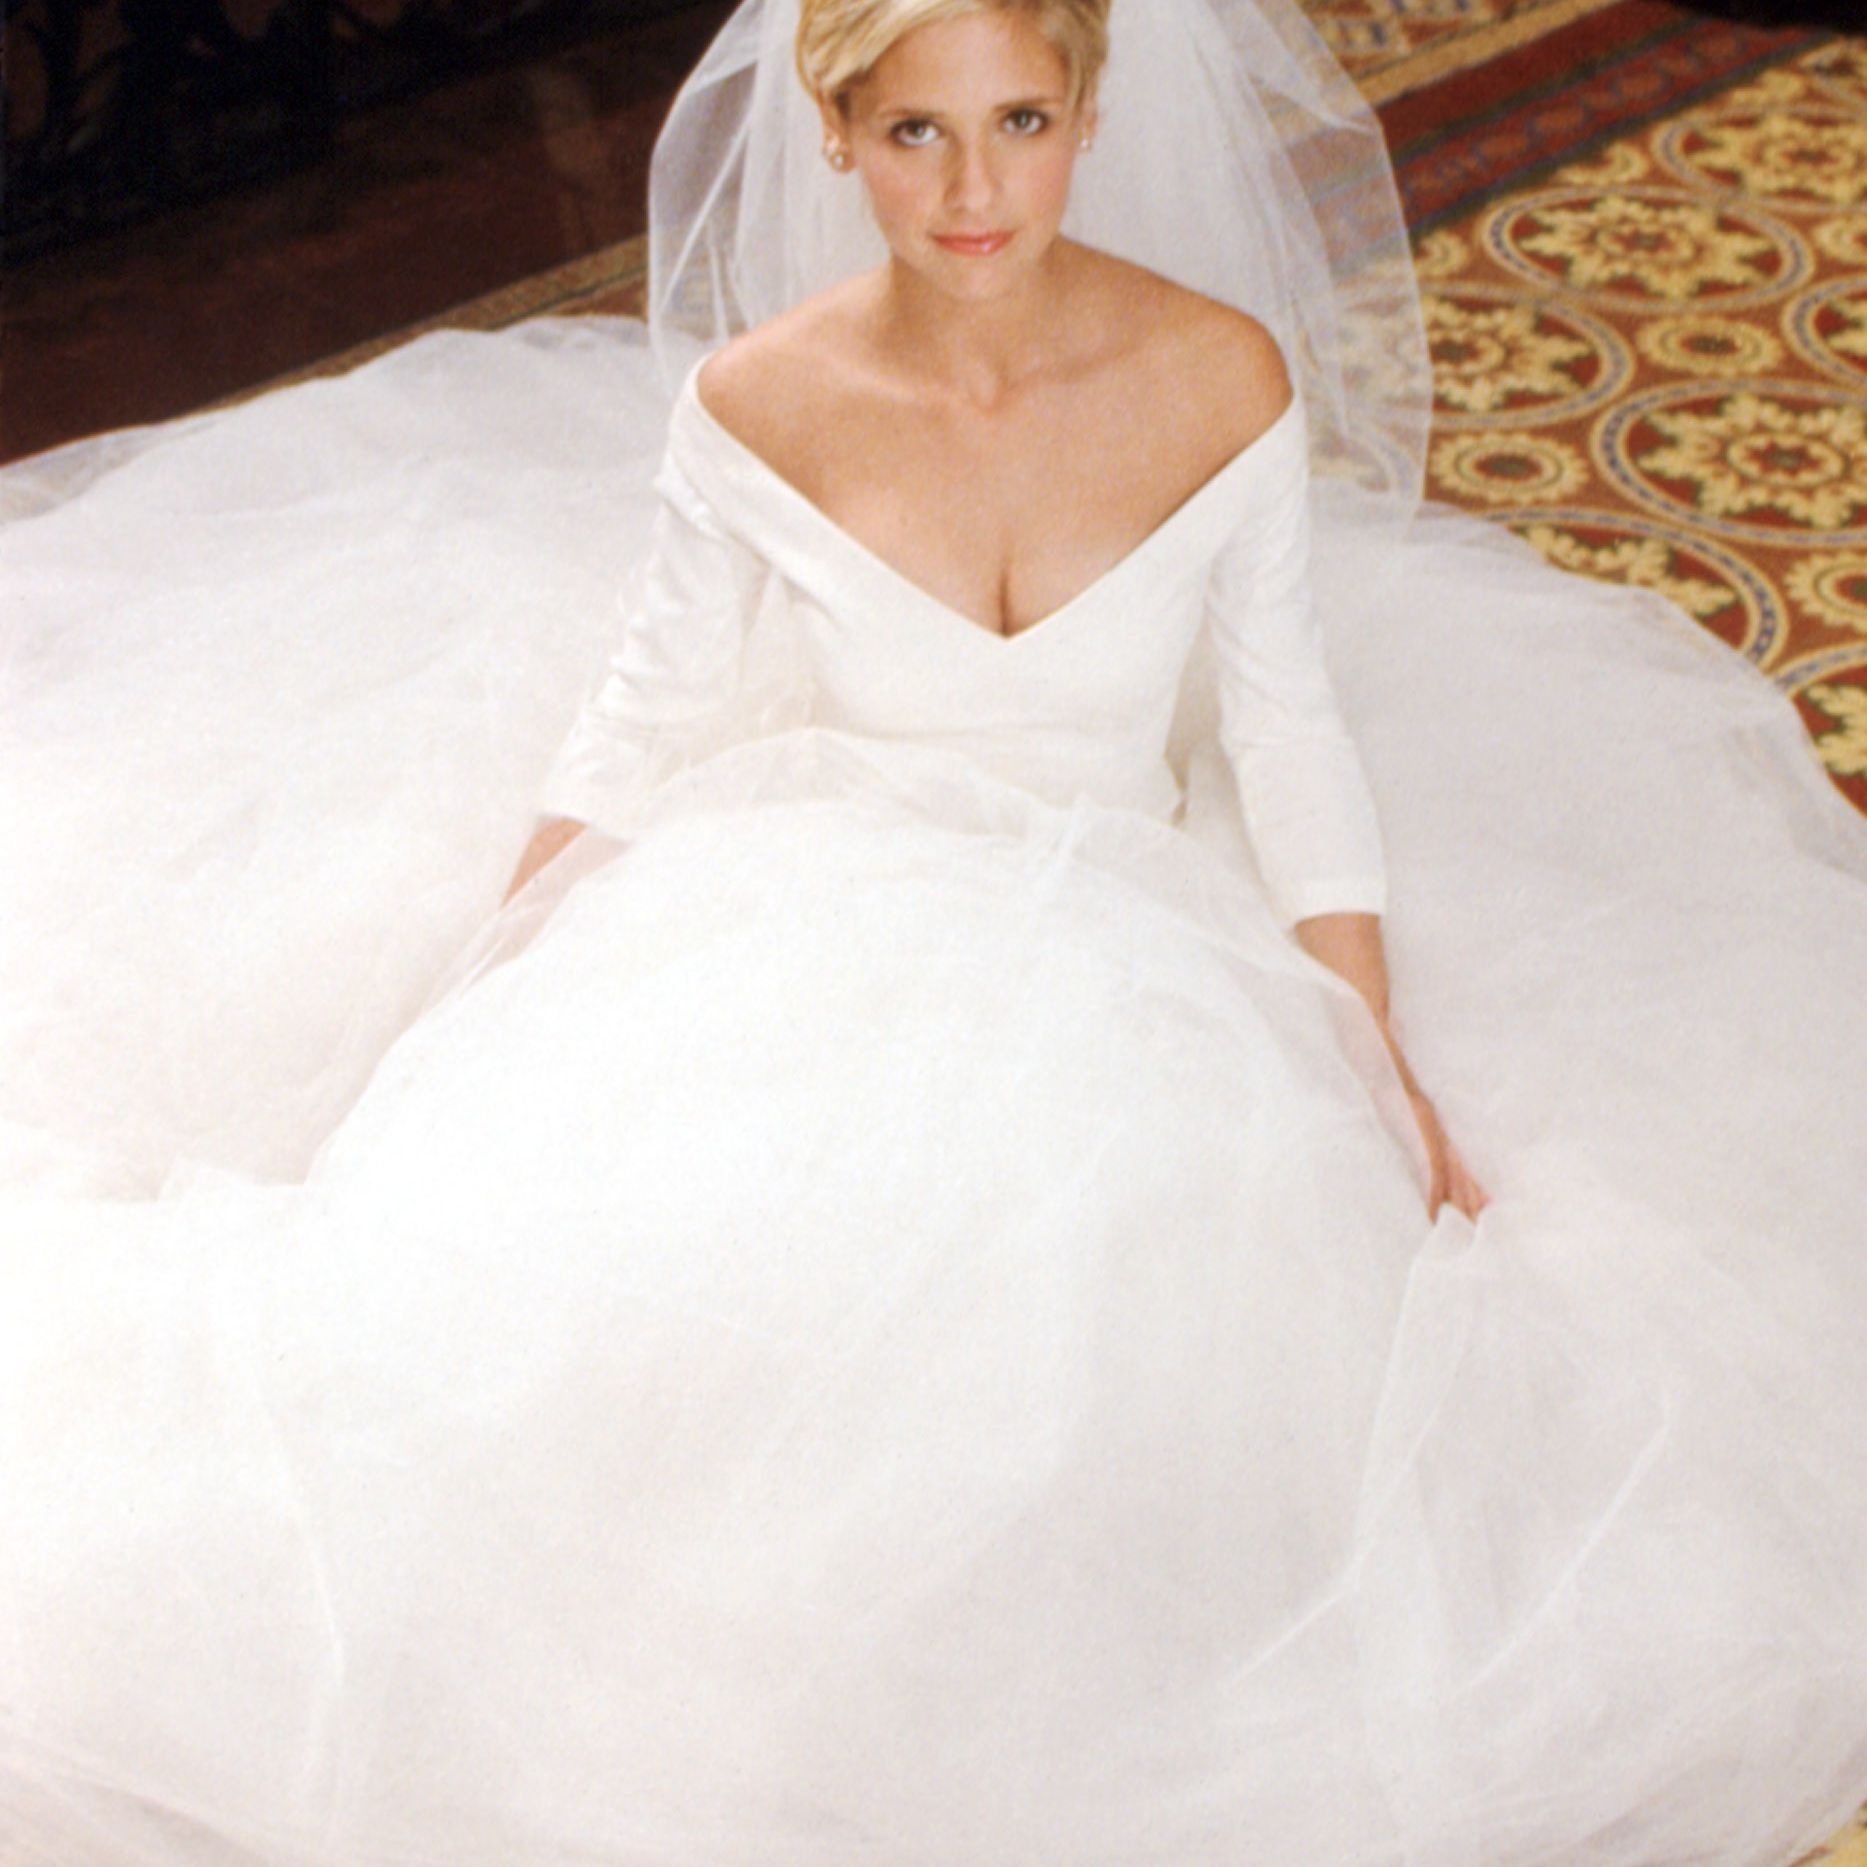 Buffy Wedding Dress Weddings Dresses